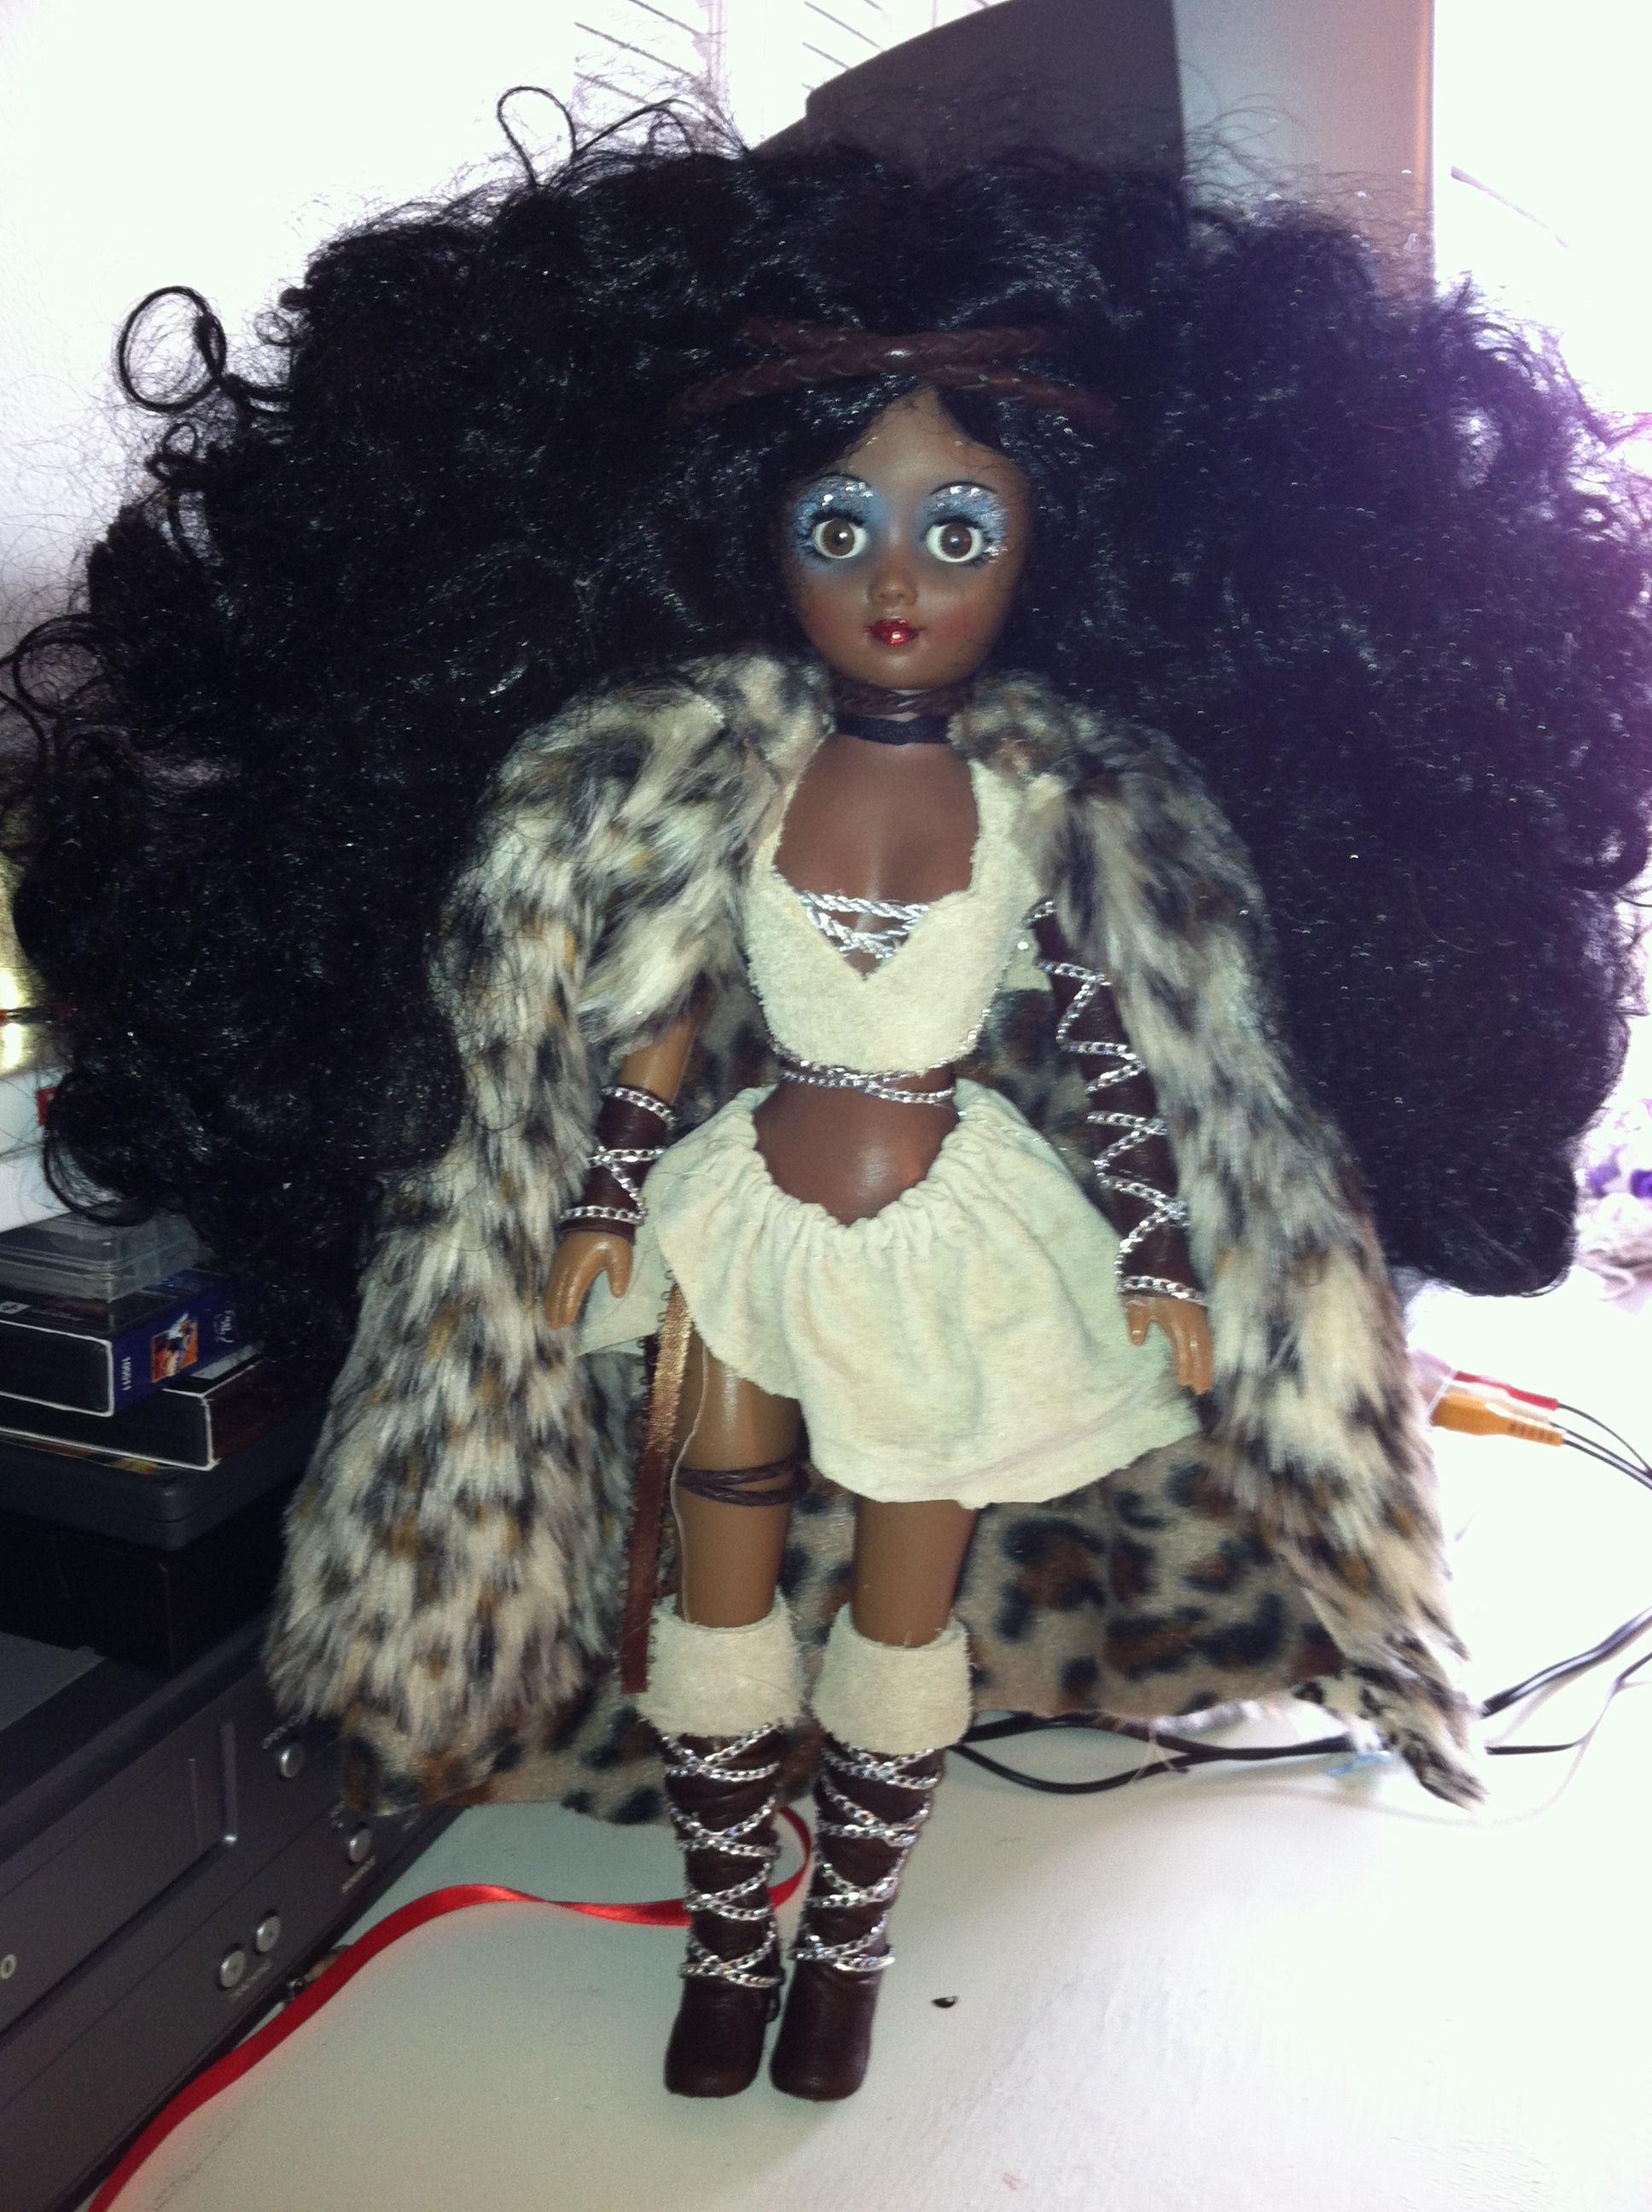 Zula: warrior maiden of the jungle